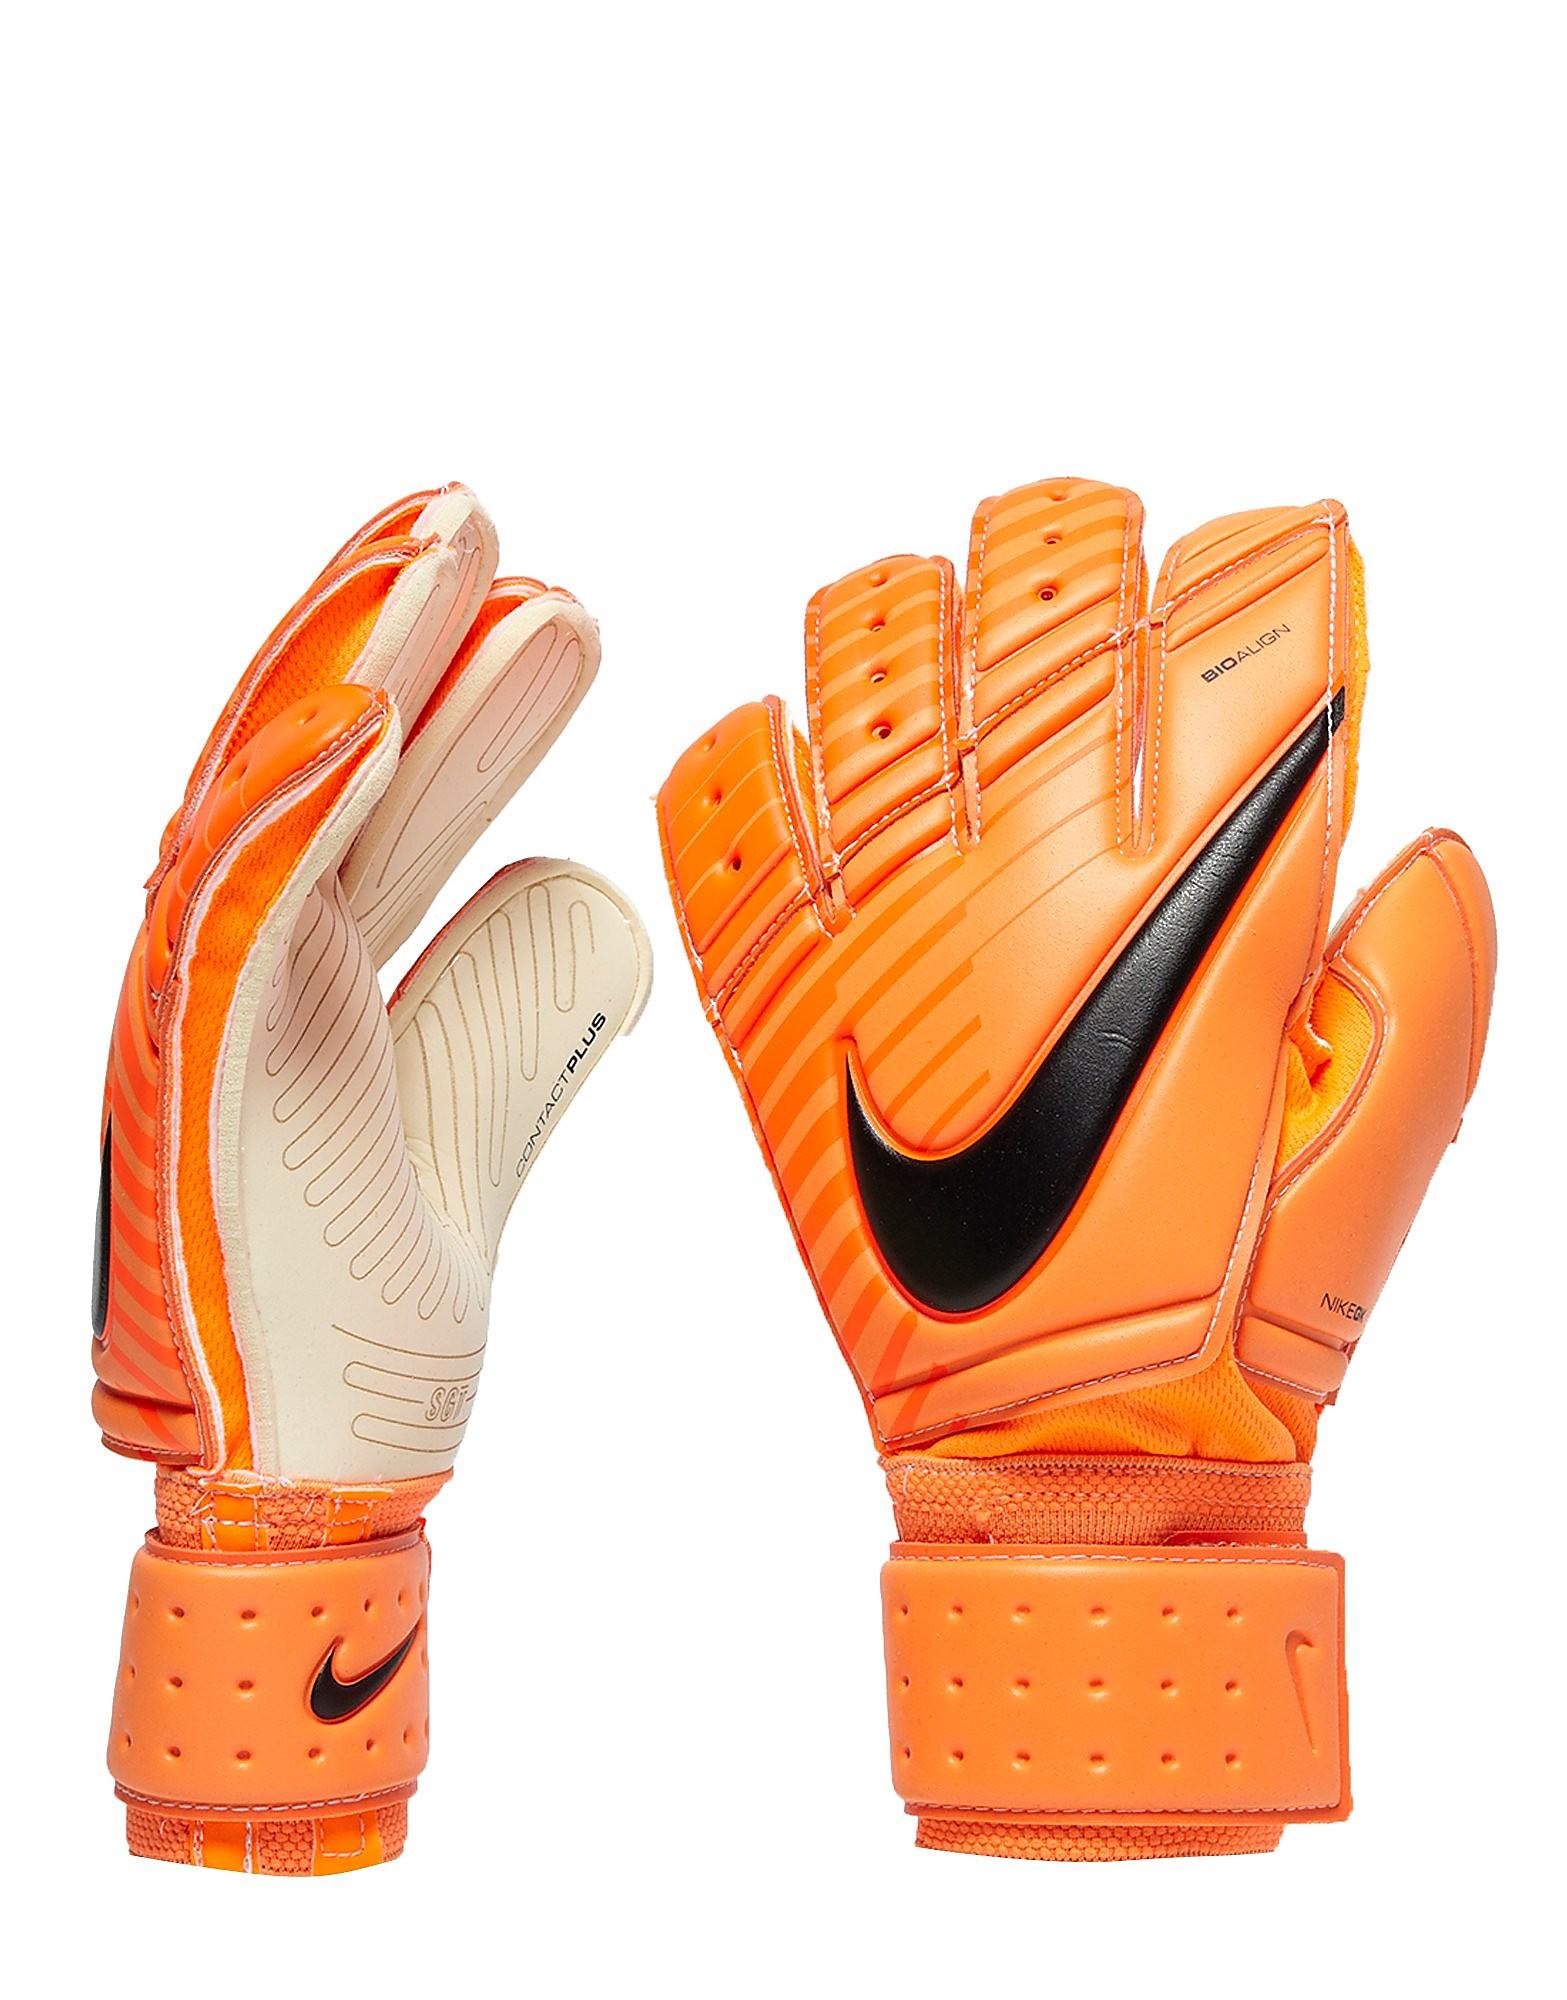 Nike Premier Goalkeeping Gloves